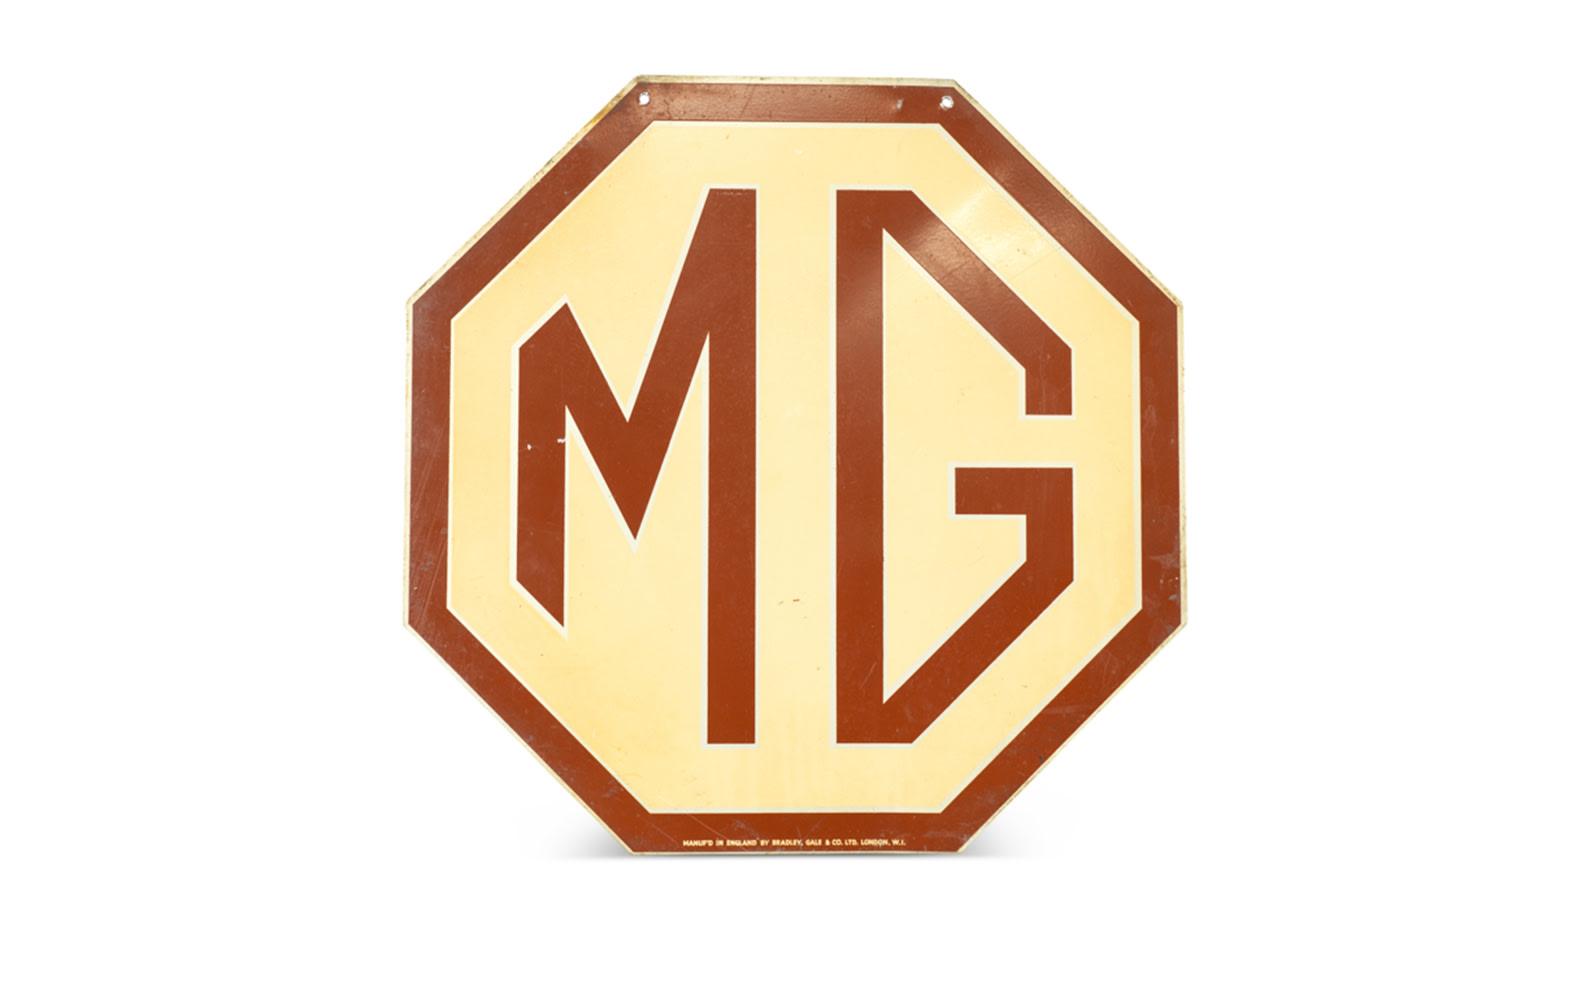 Octagonal MG Dealership Sign